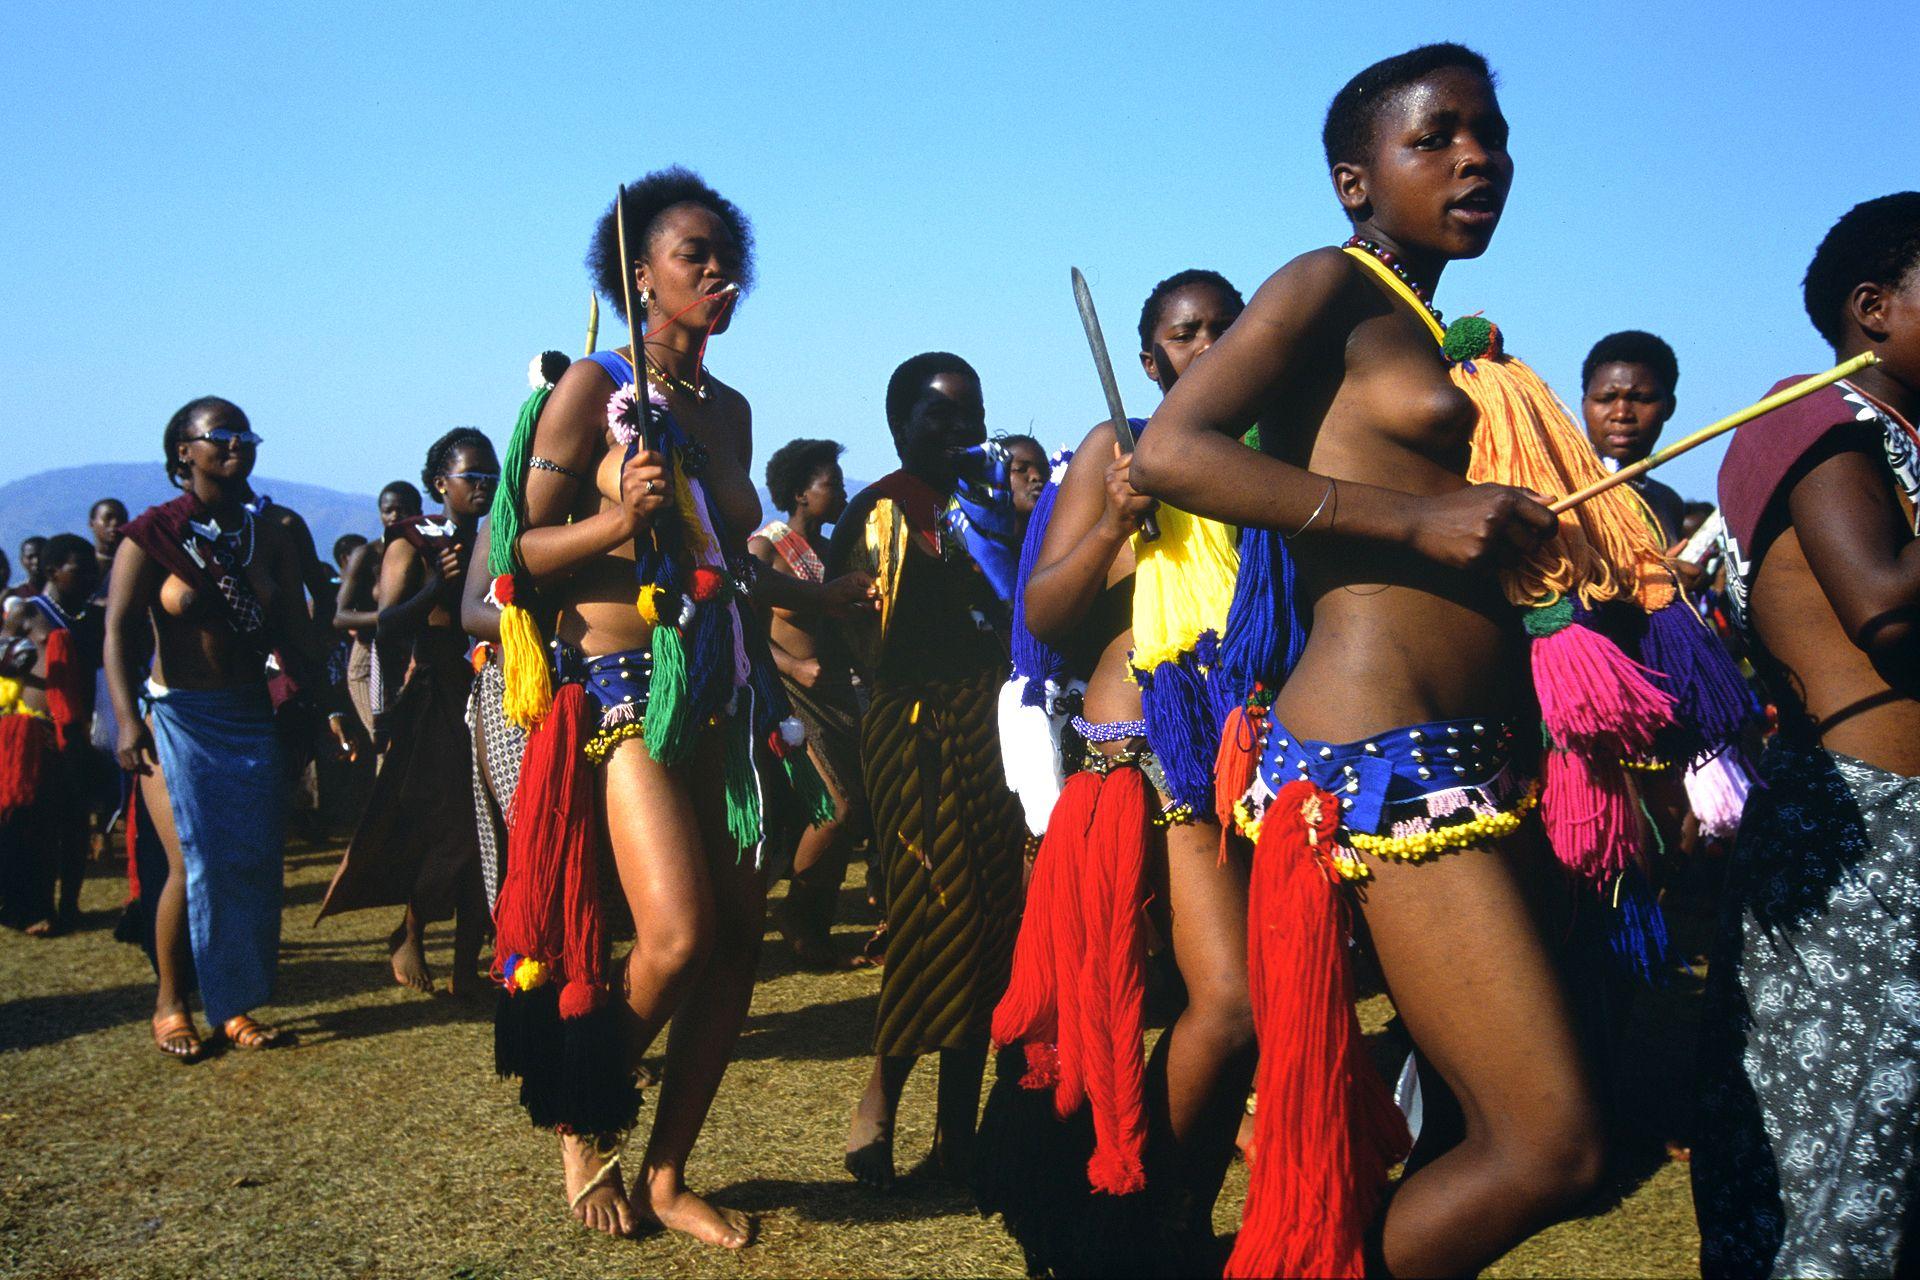 Zulu girls attend Umhlanga, the annual Reed Dance festival ...